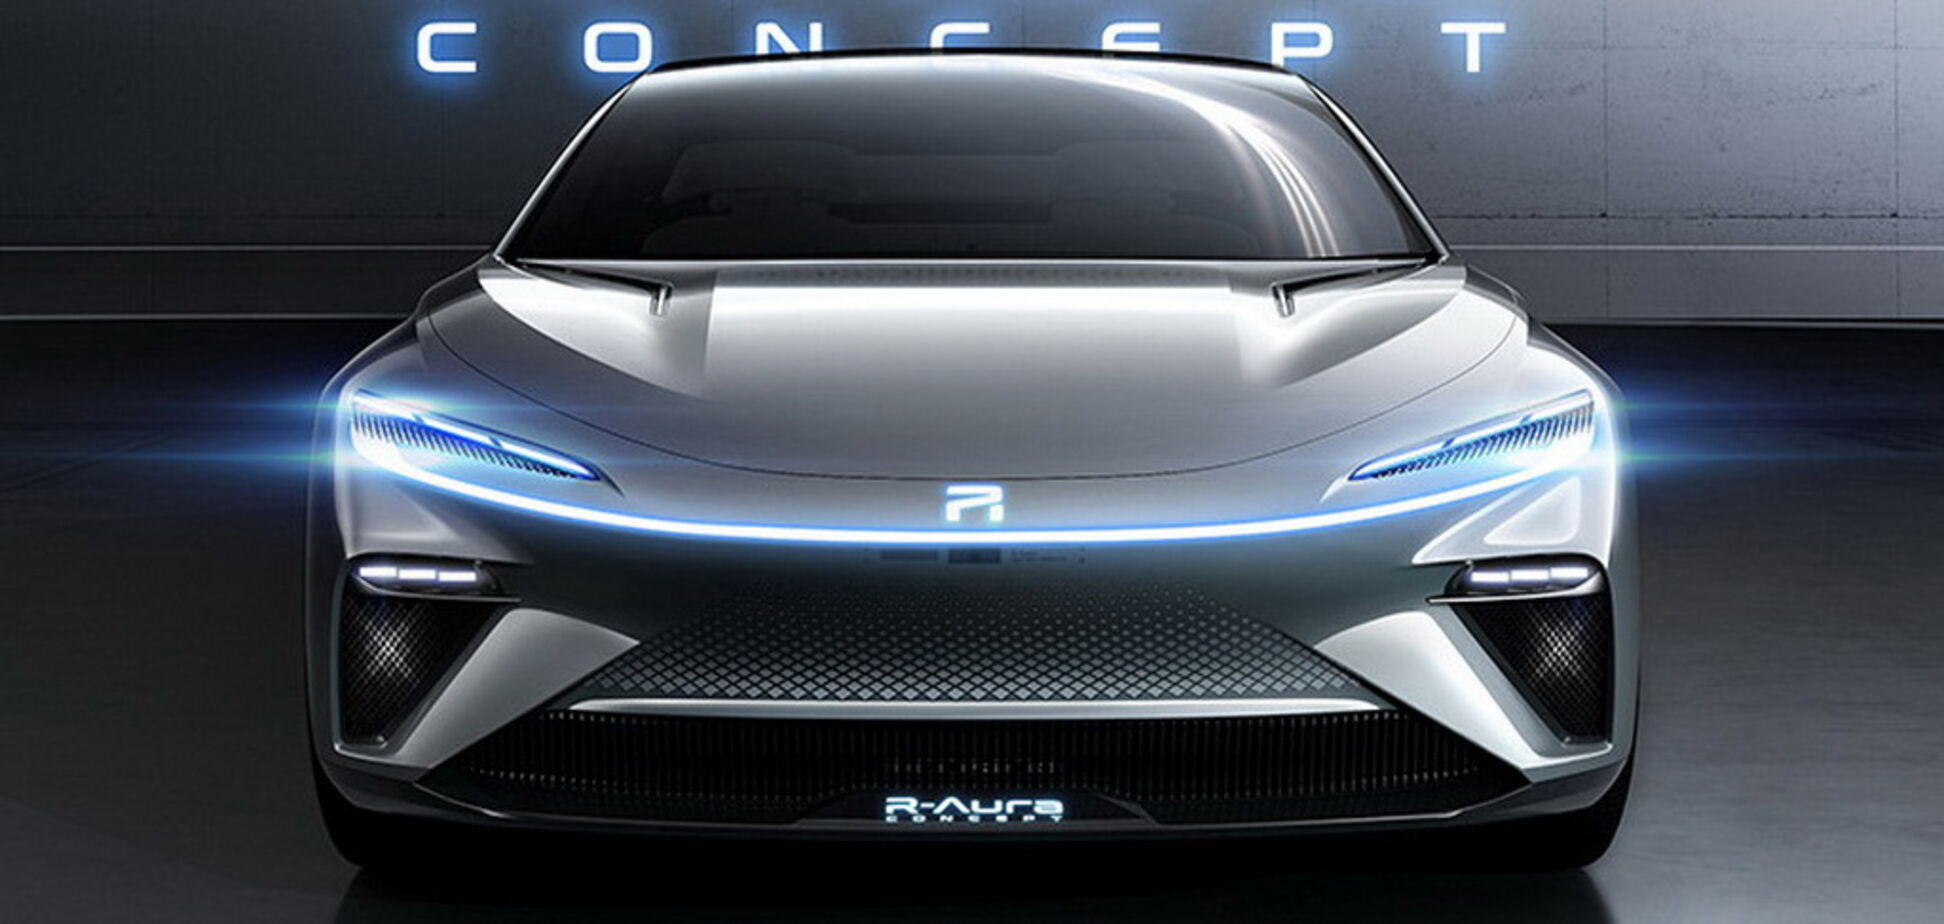 Чергового конкурента Tesla Model S створили в Китаї